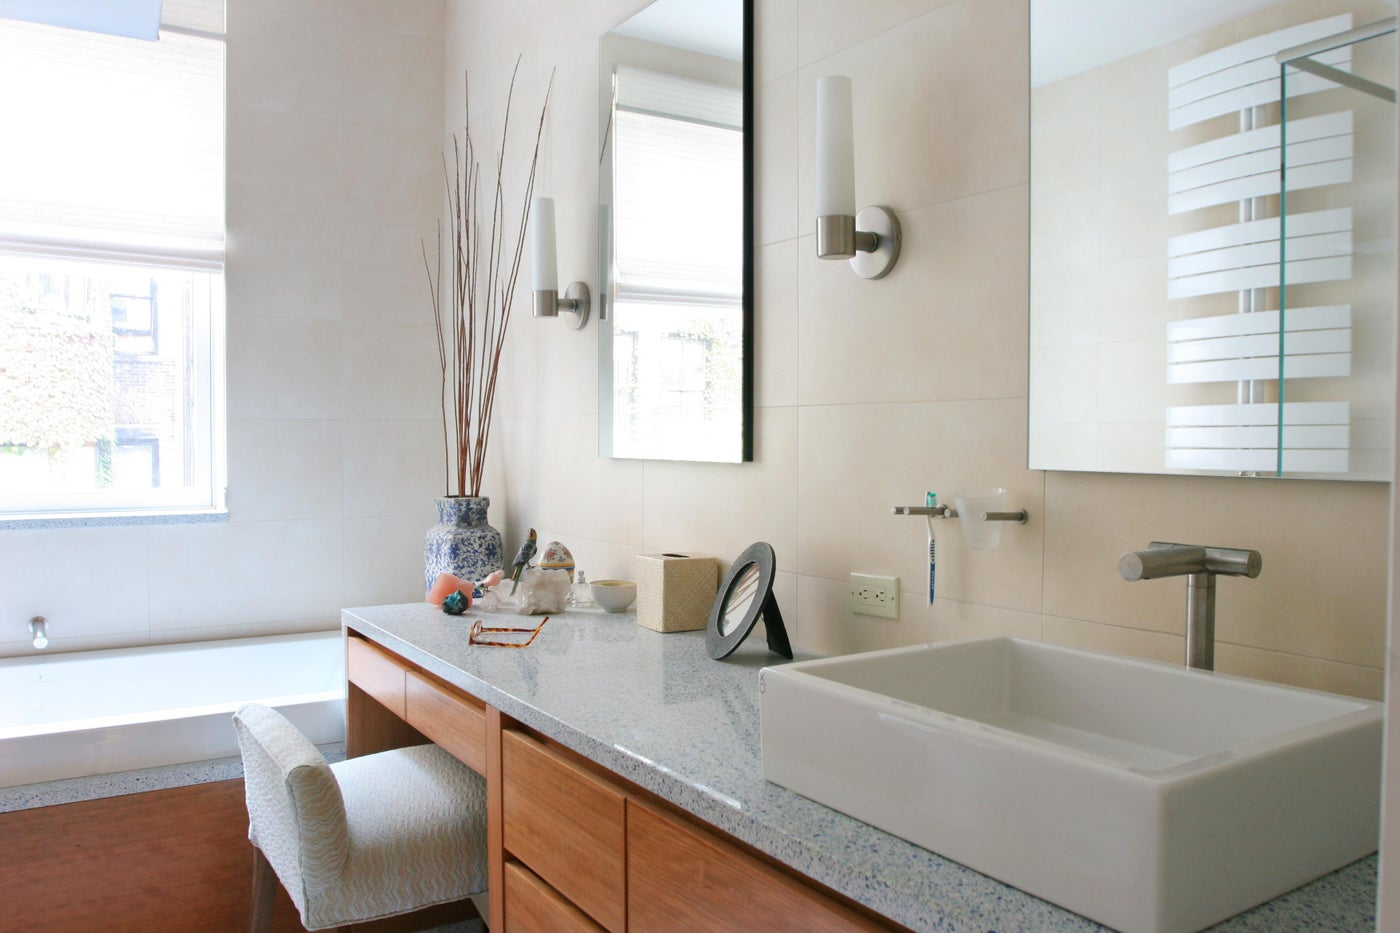 Gleicher Eco-Friendly Townhouse Master Bathroom Vanity